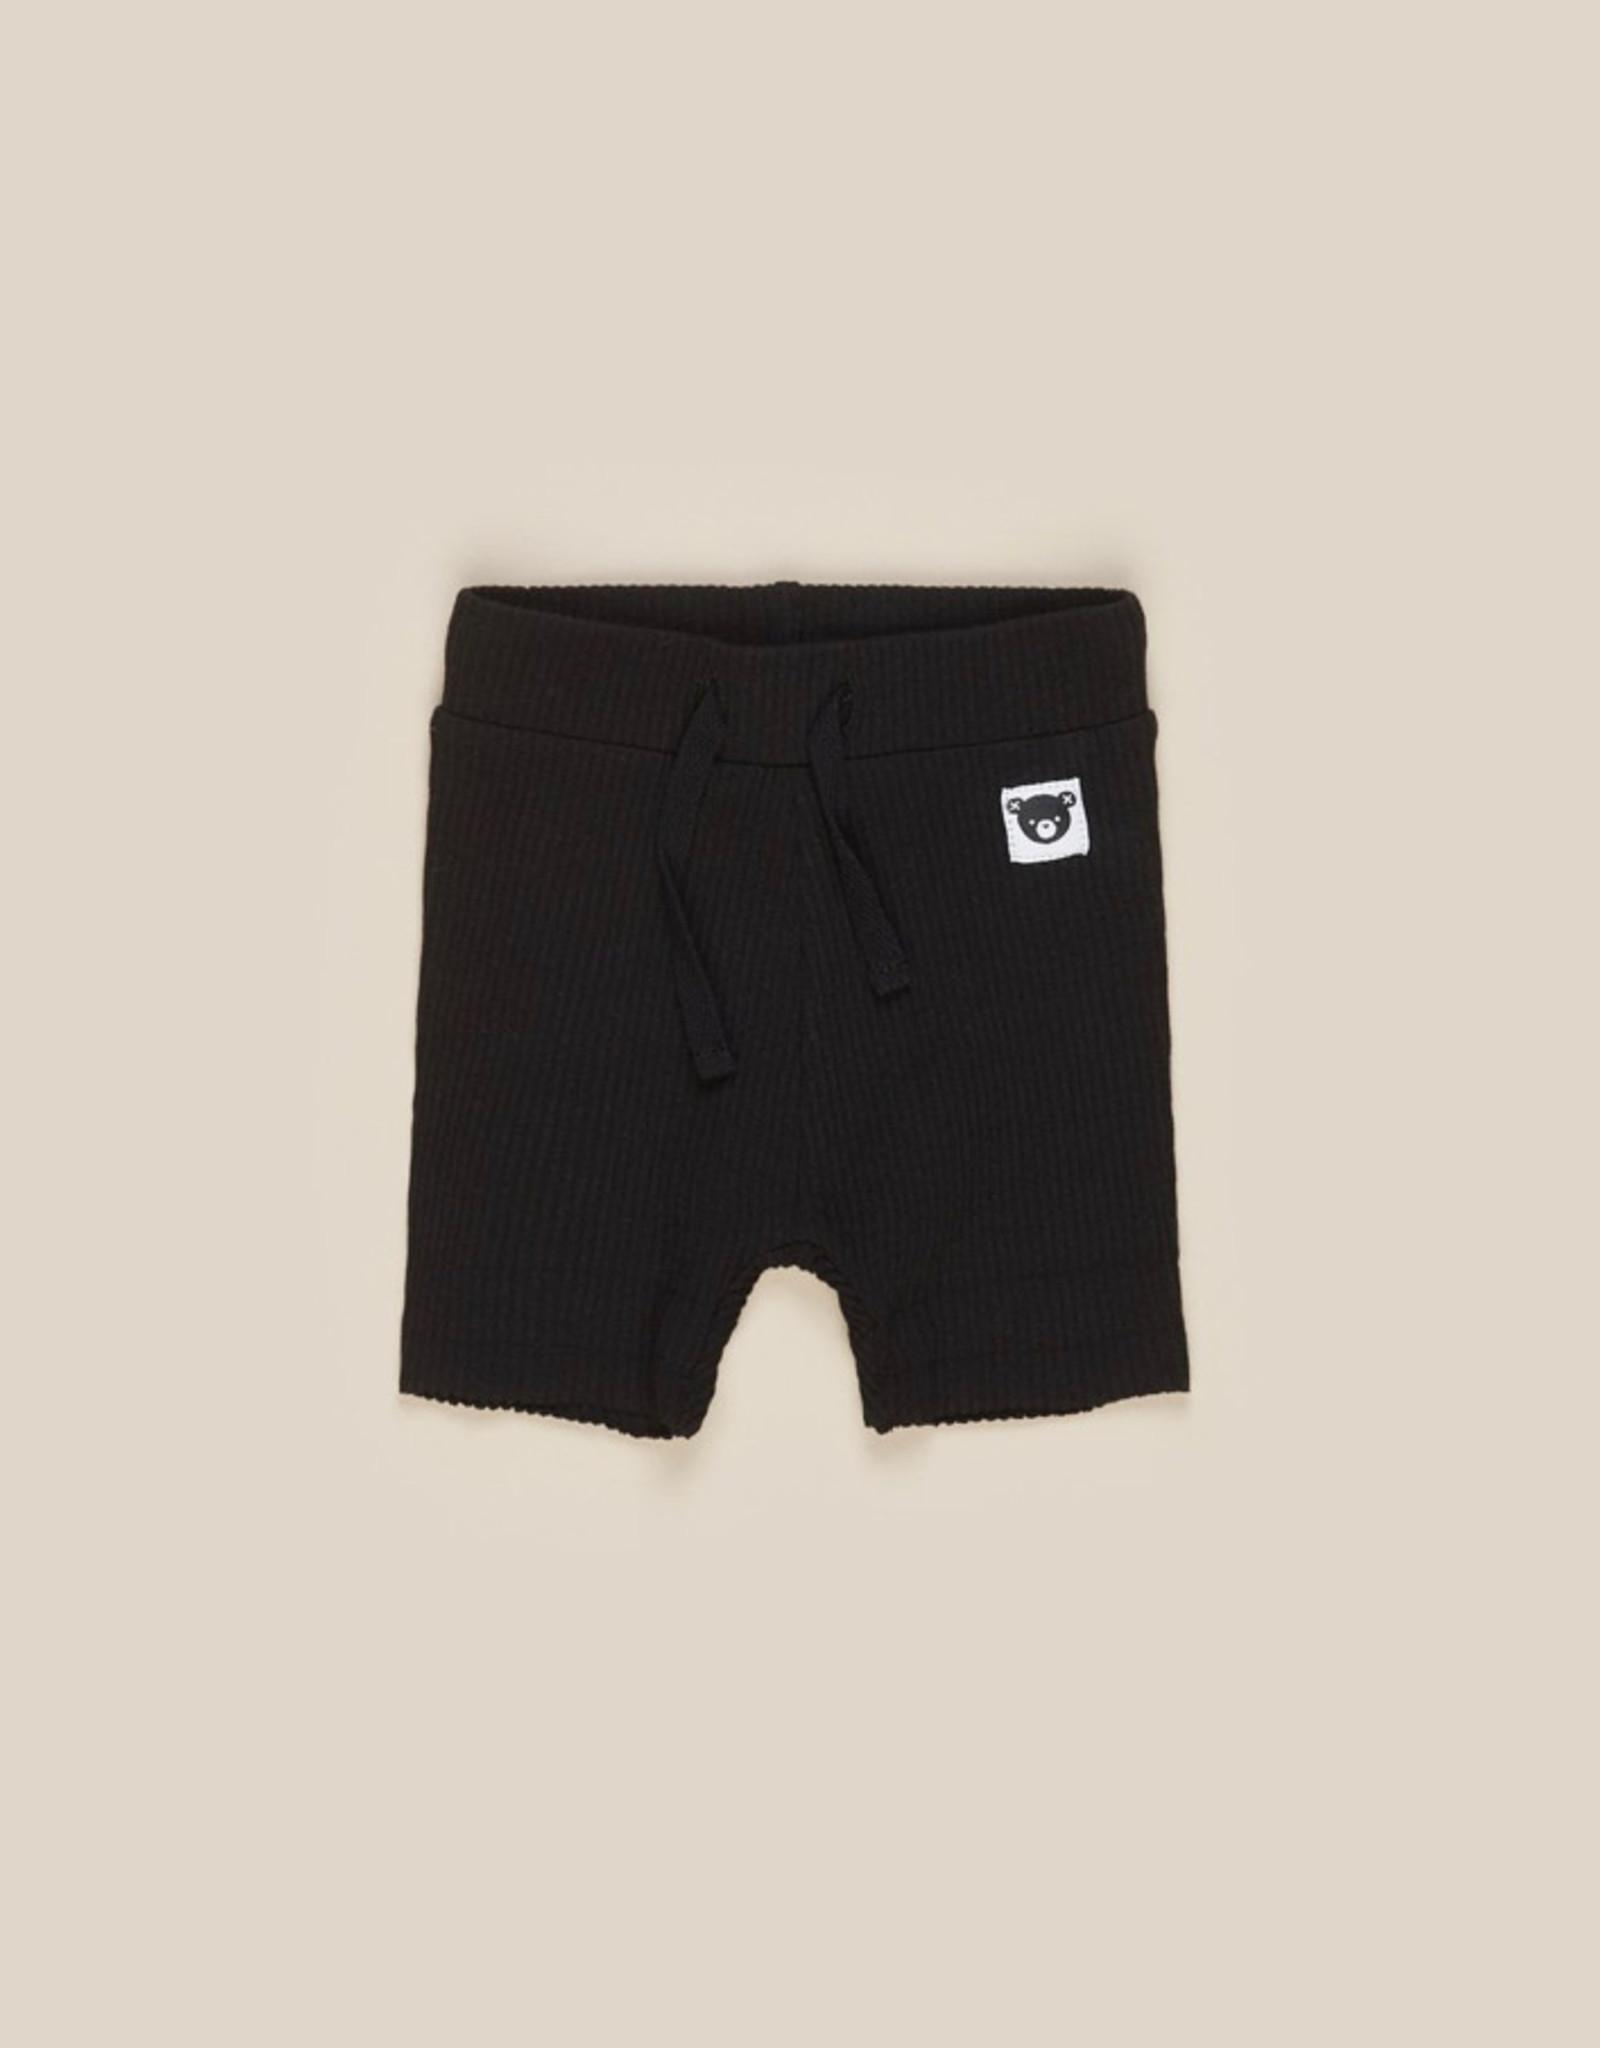 HUXBABY HUX - Black Rib Shorts